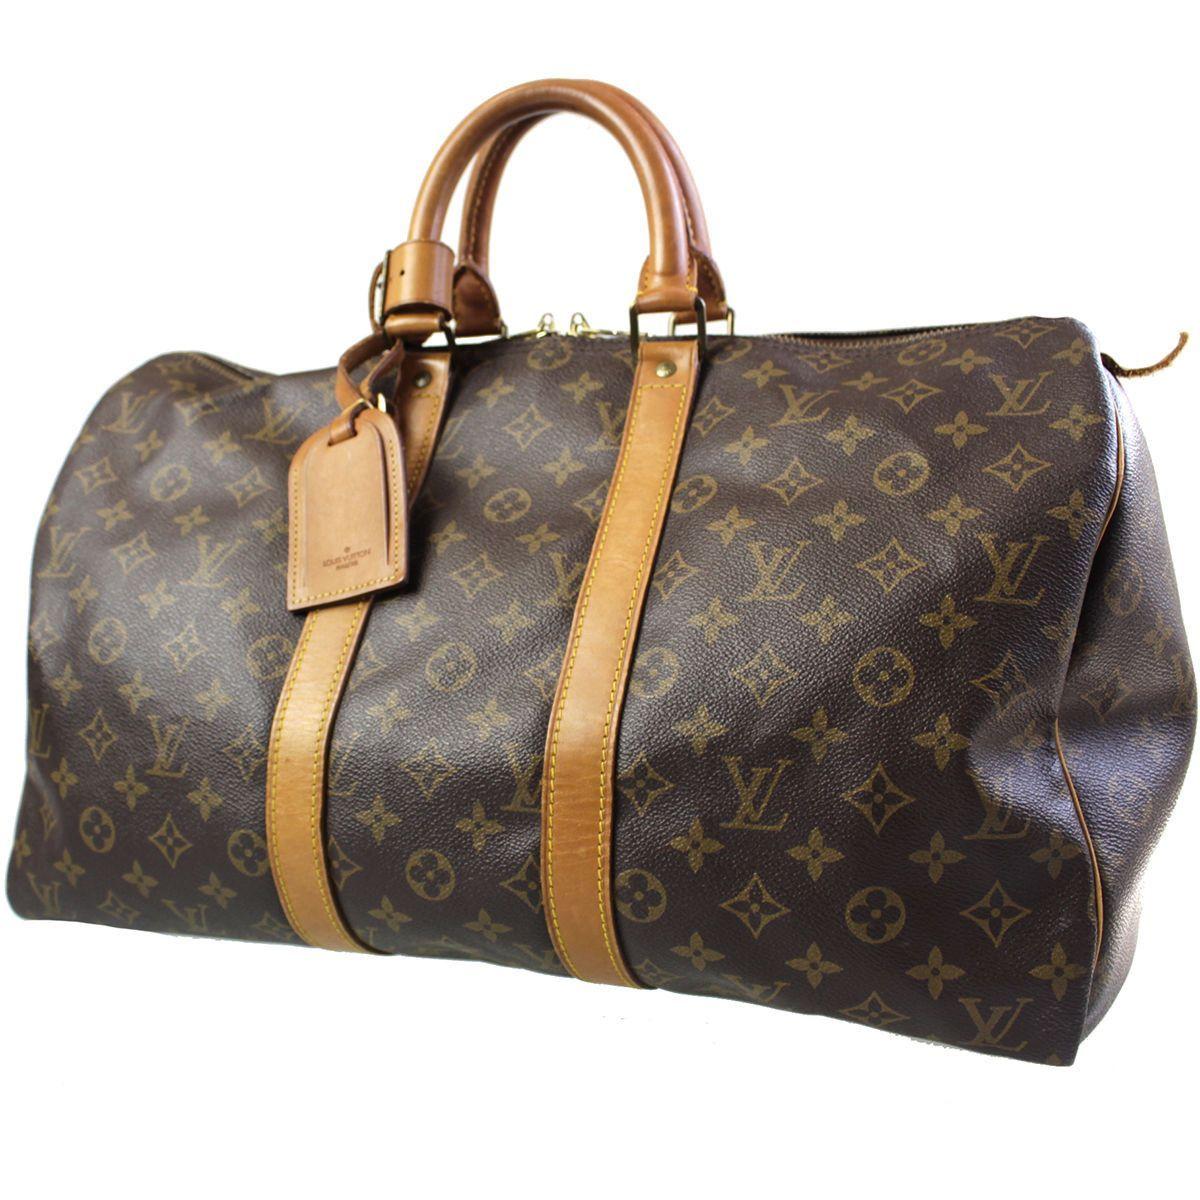 Louis Vuitton Keepall 45 Hand Boston Monogram France Bag